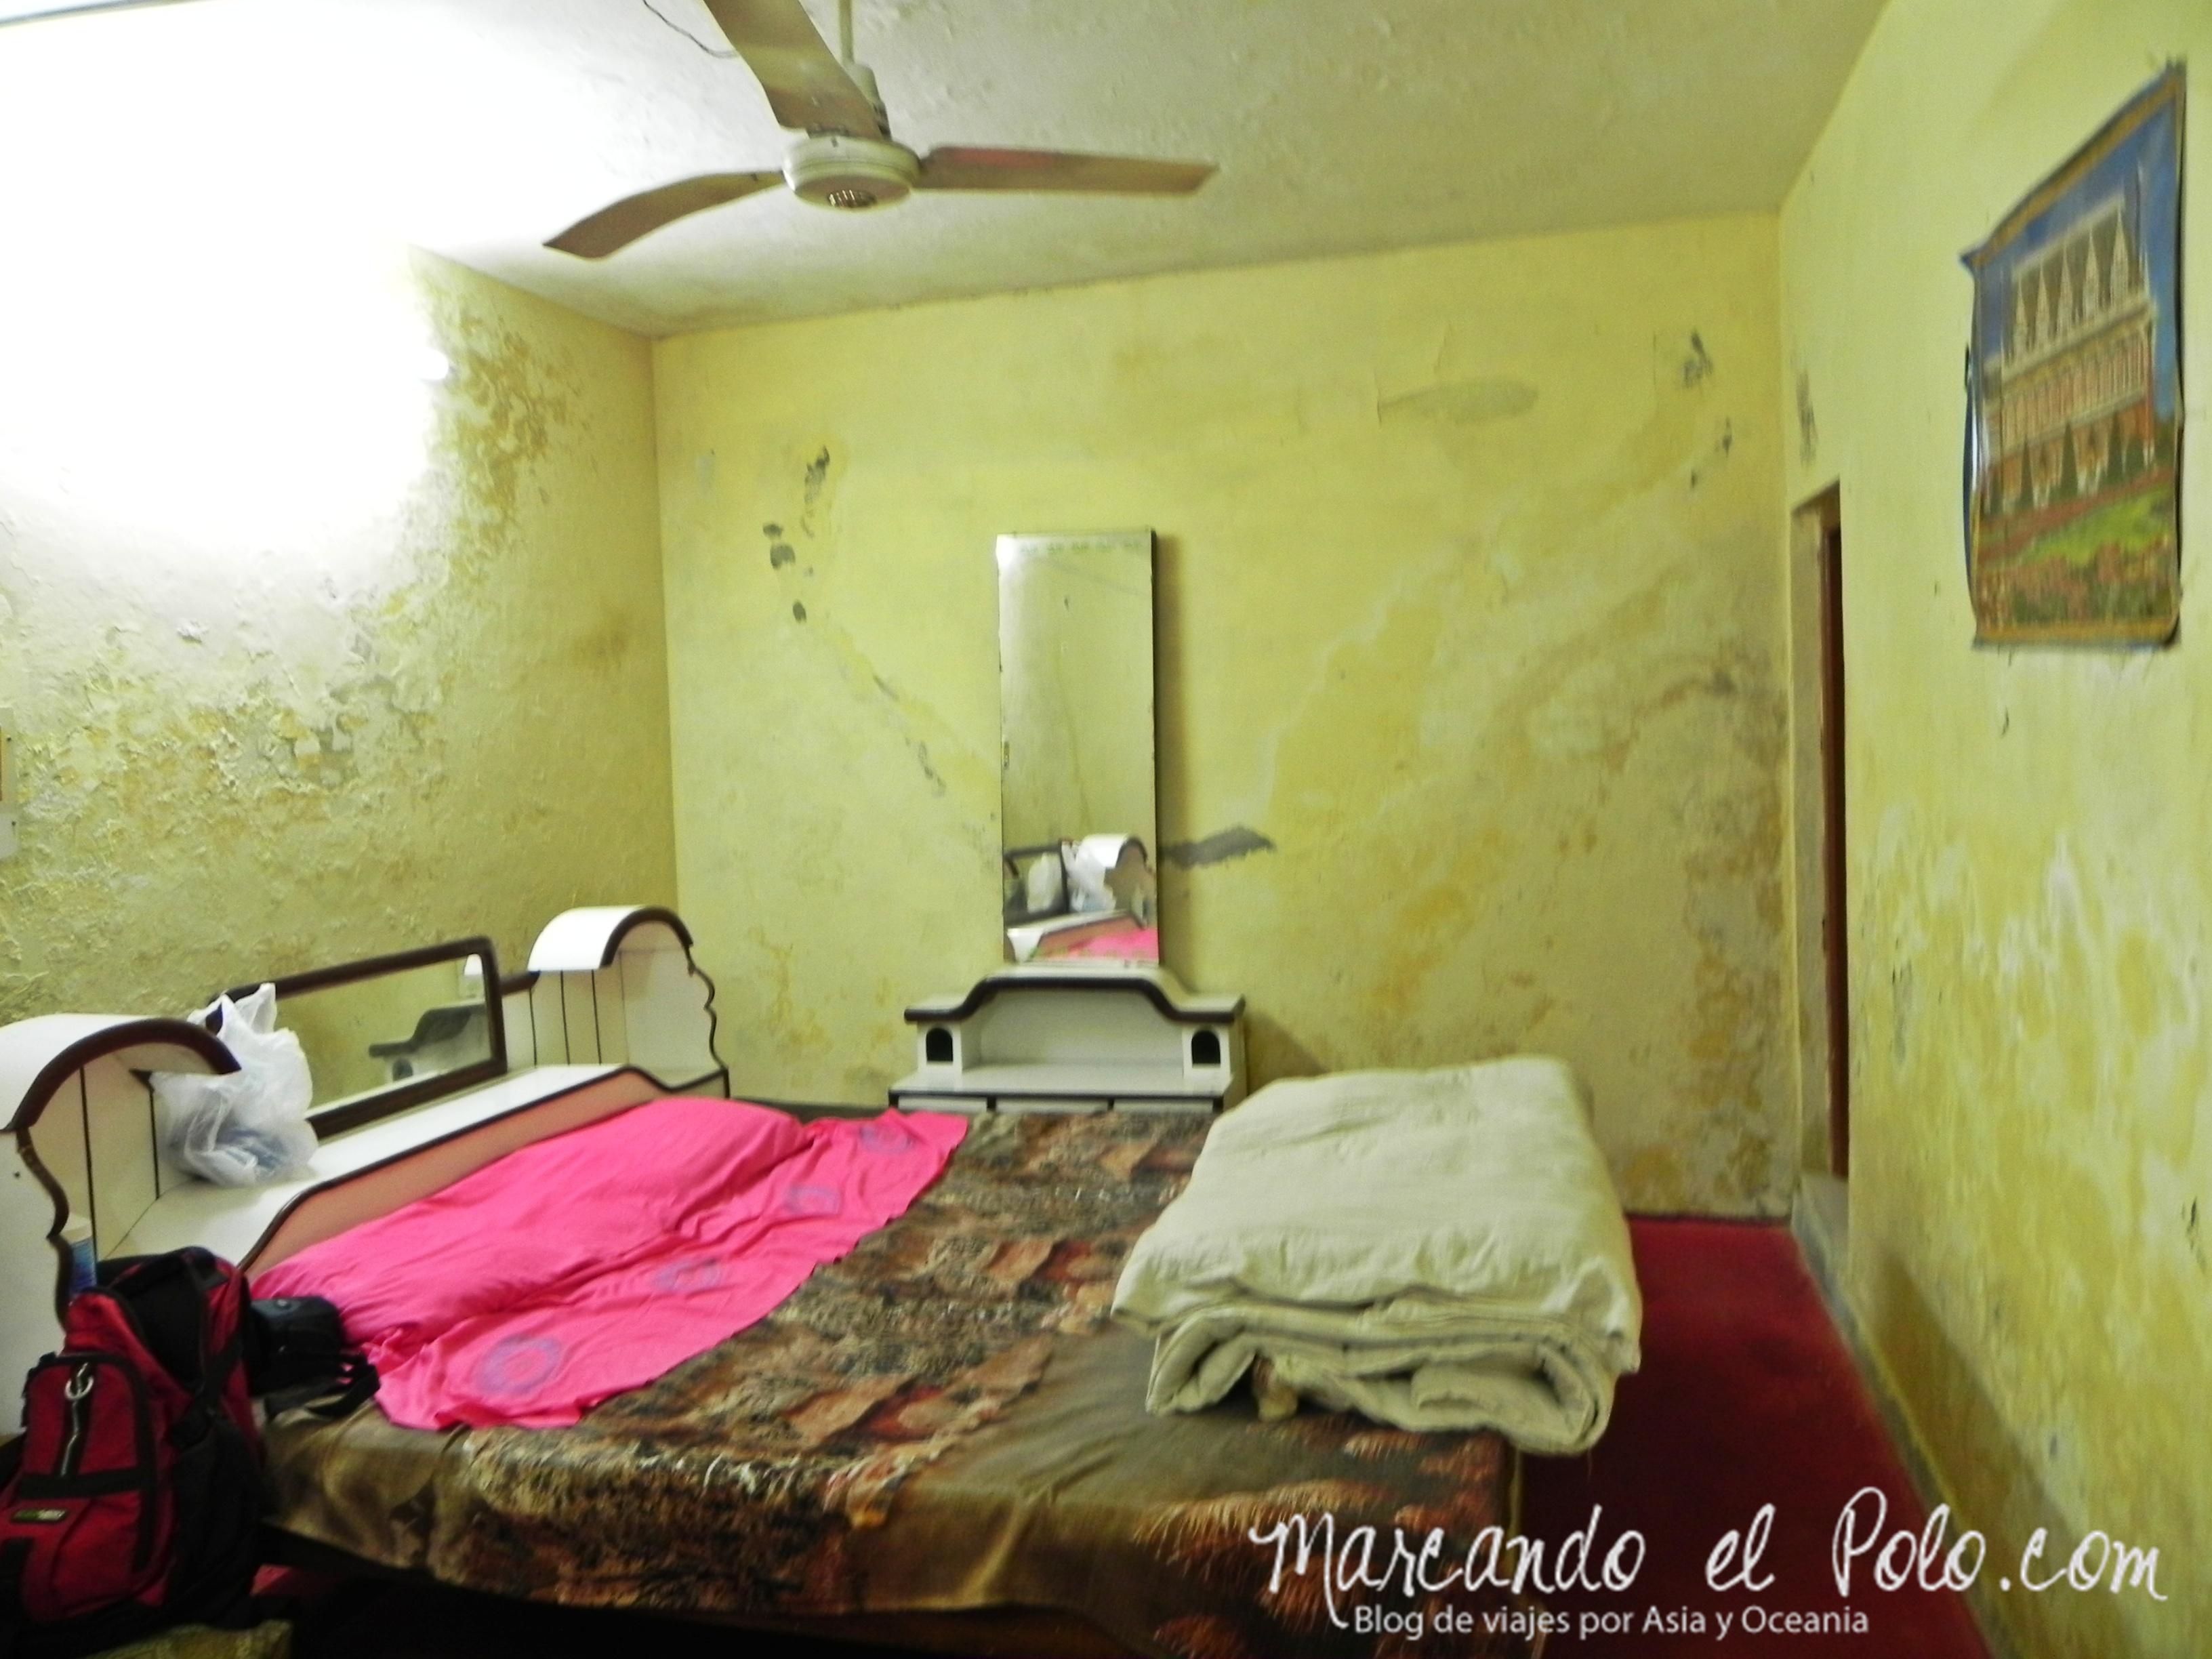 Presupuesto para viajar a India: Shiva Gusthouse, Dharamsala